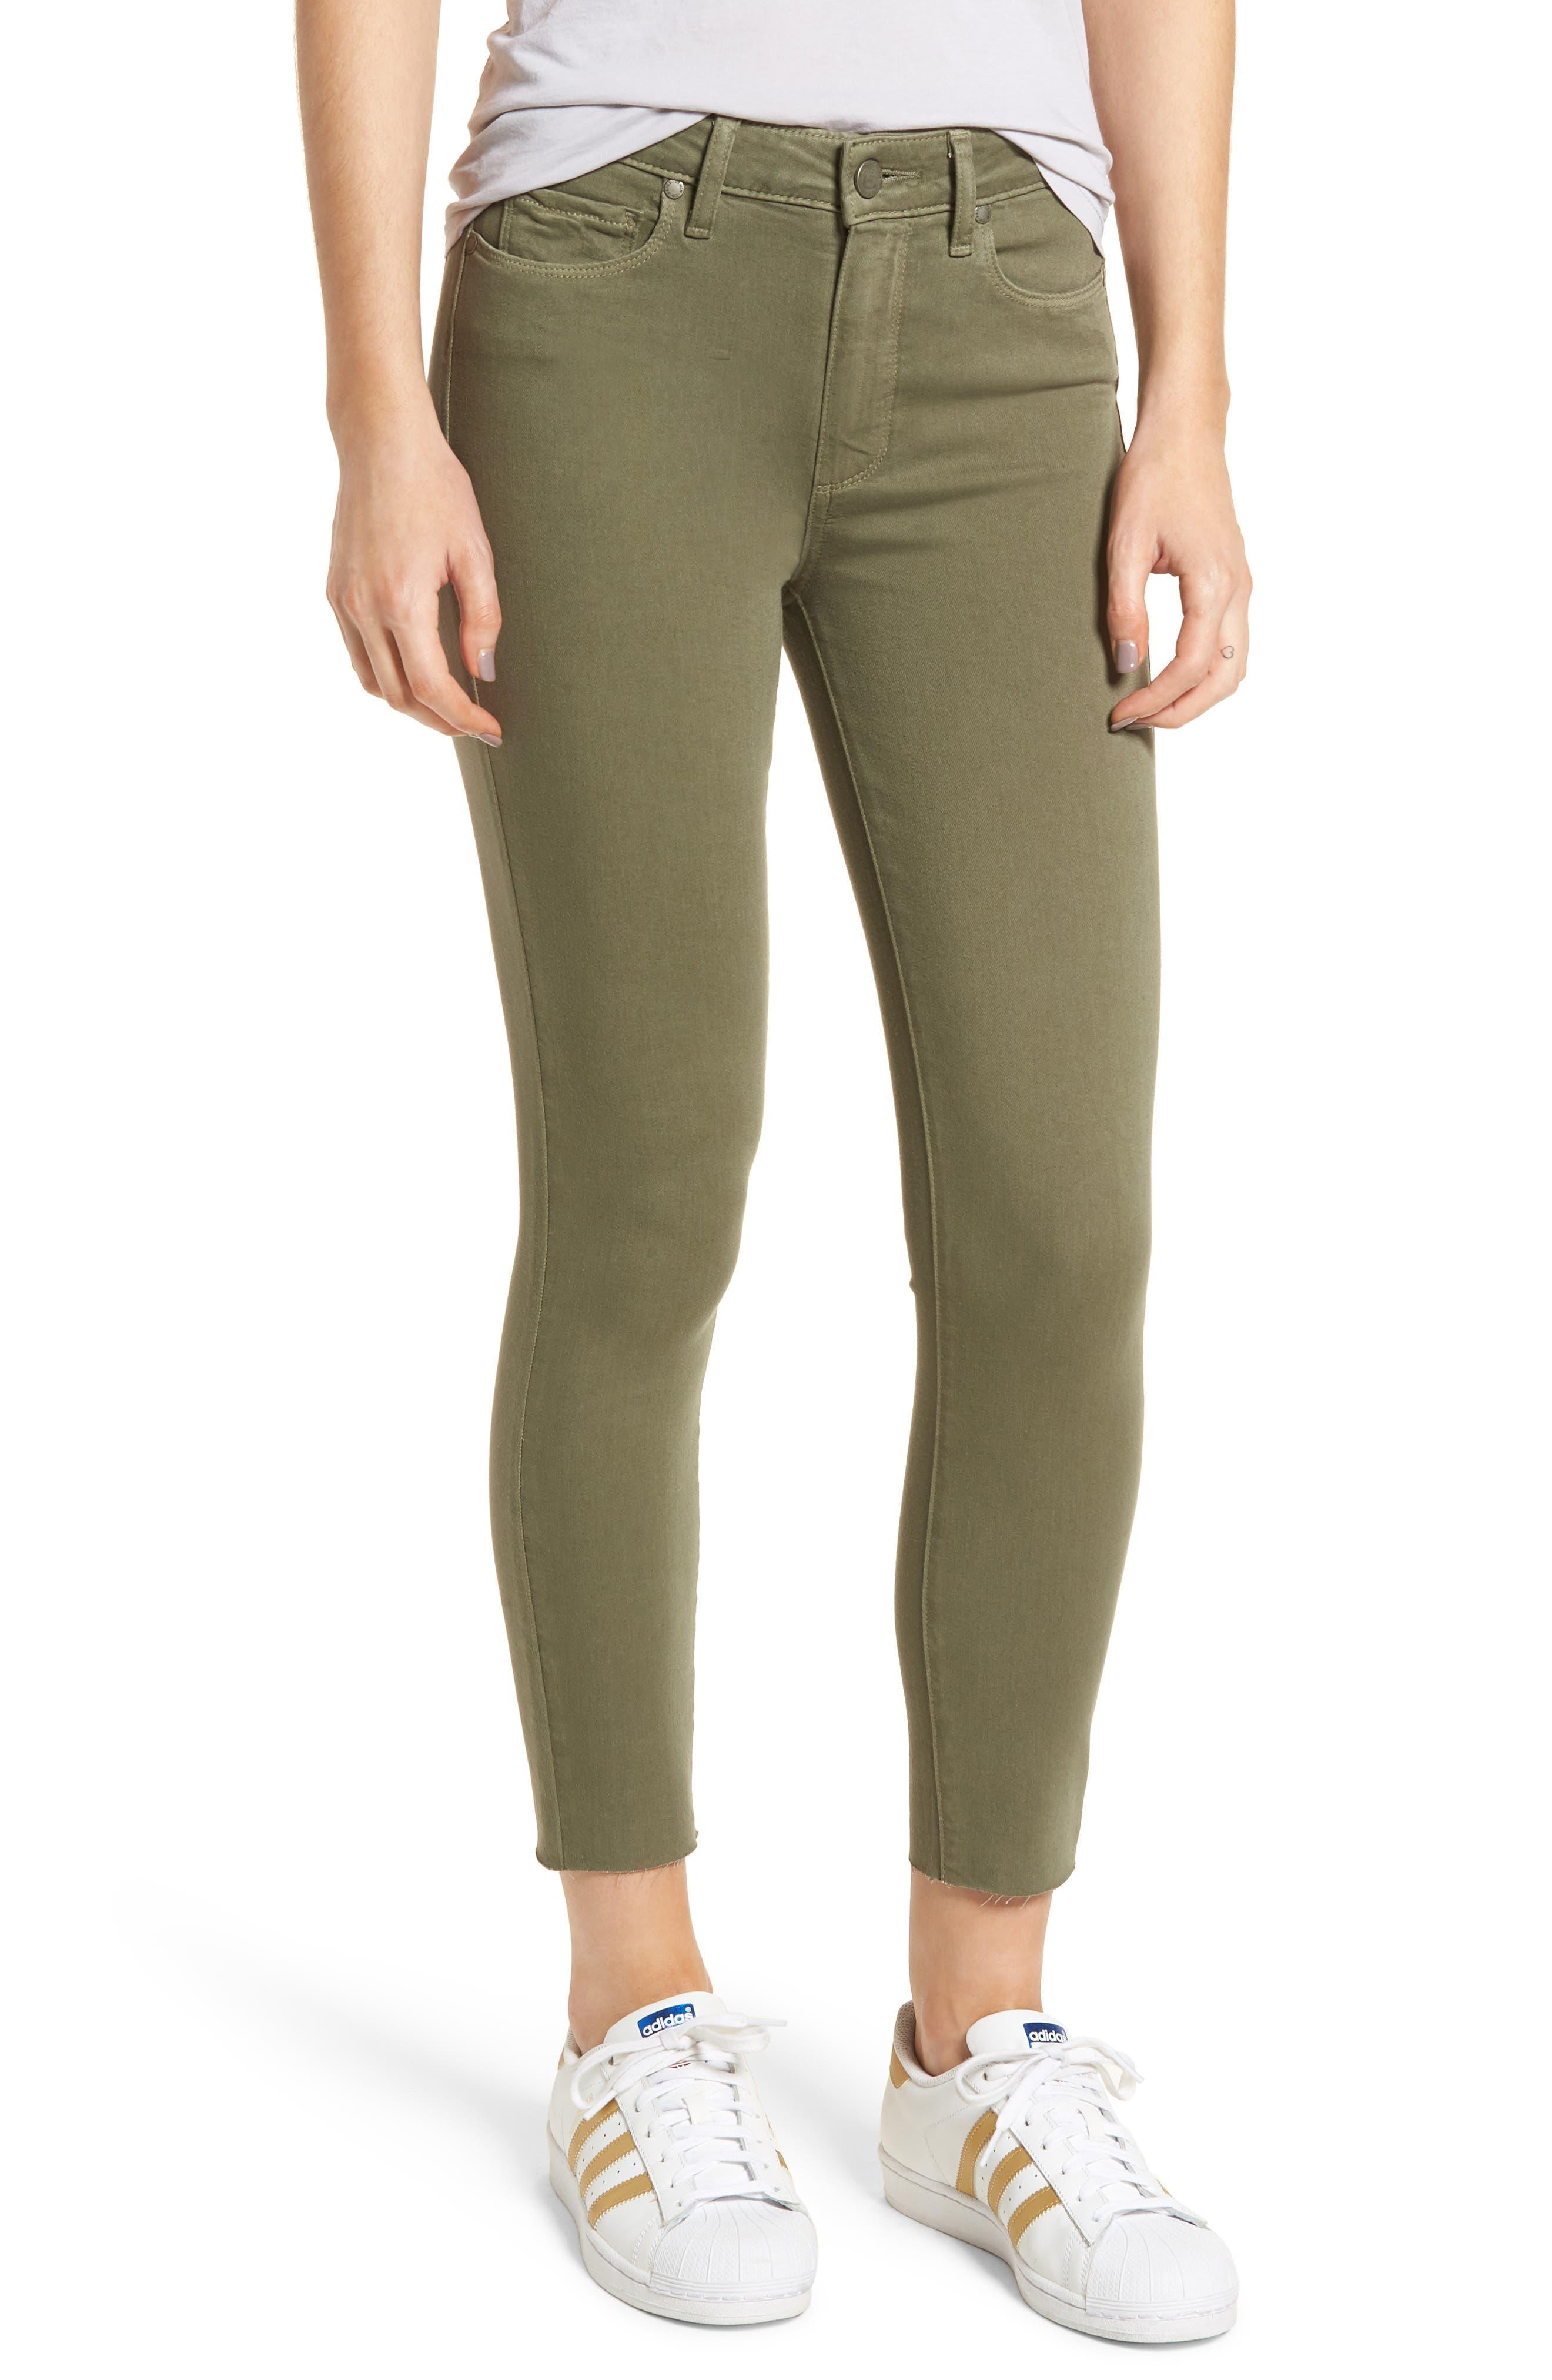 Hoxton High Waist Crop Skinny Jeans,                             Main thumbnail 1, color,                             Vintage Green